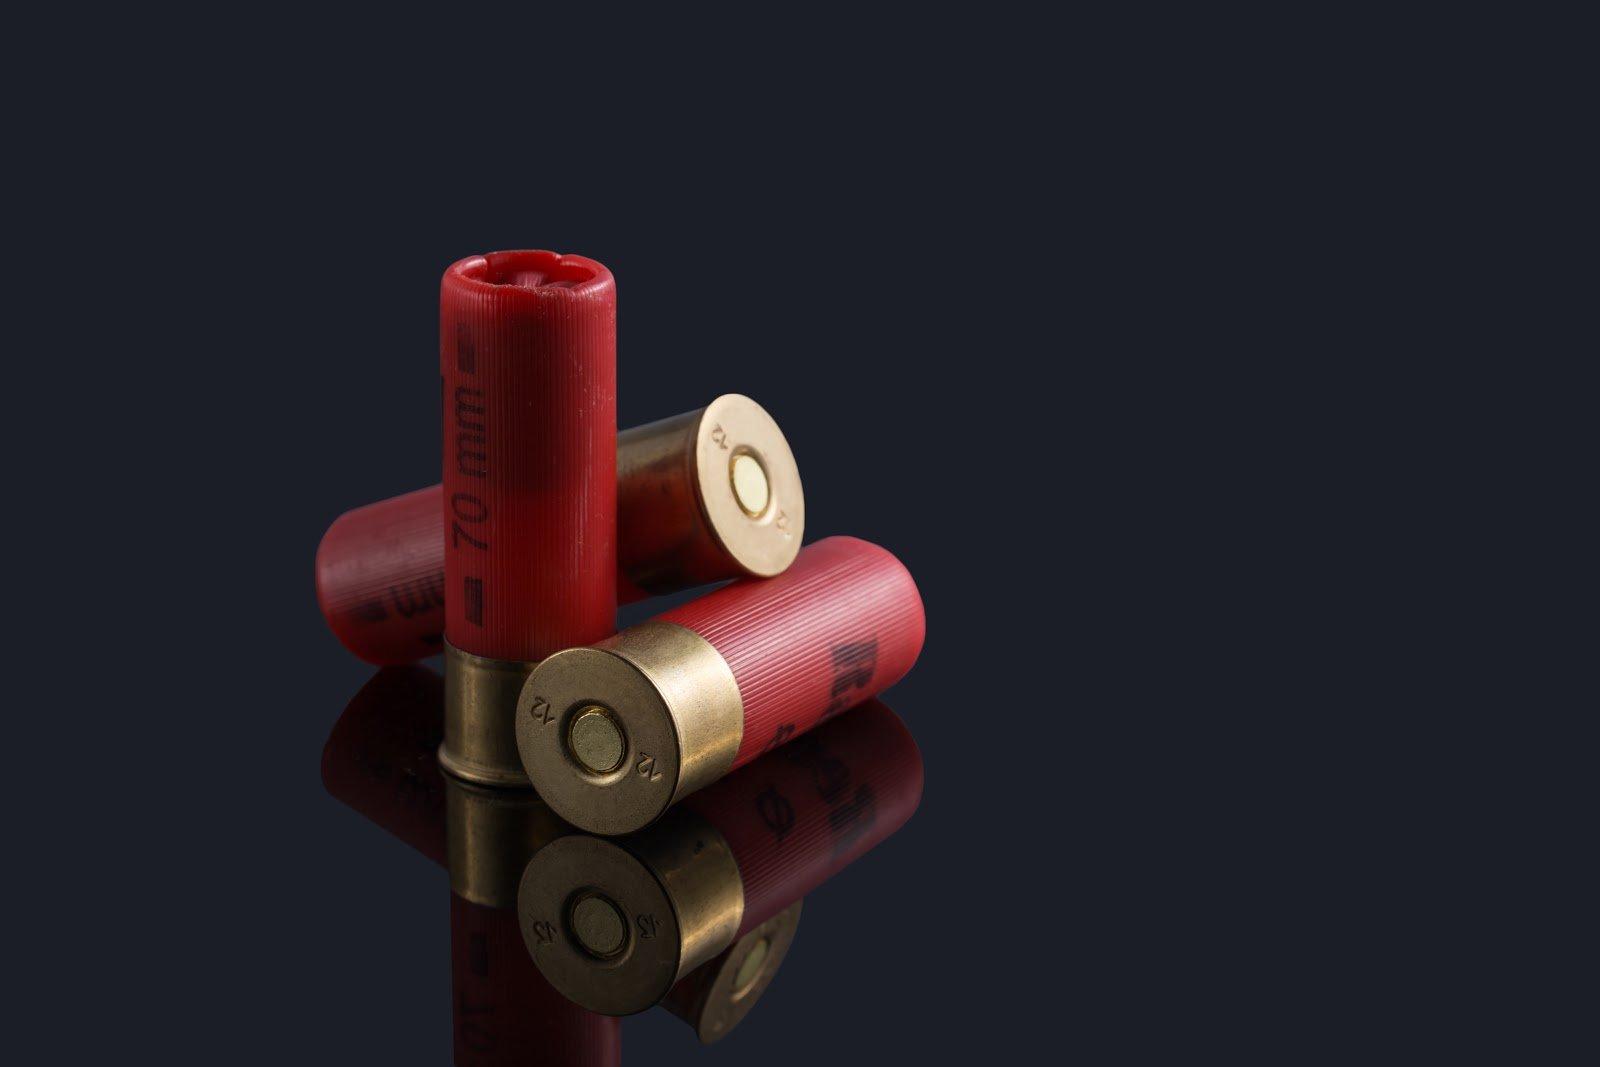 three 70mm red shotgun shells with a black background